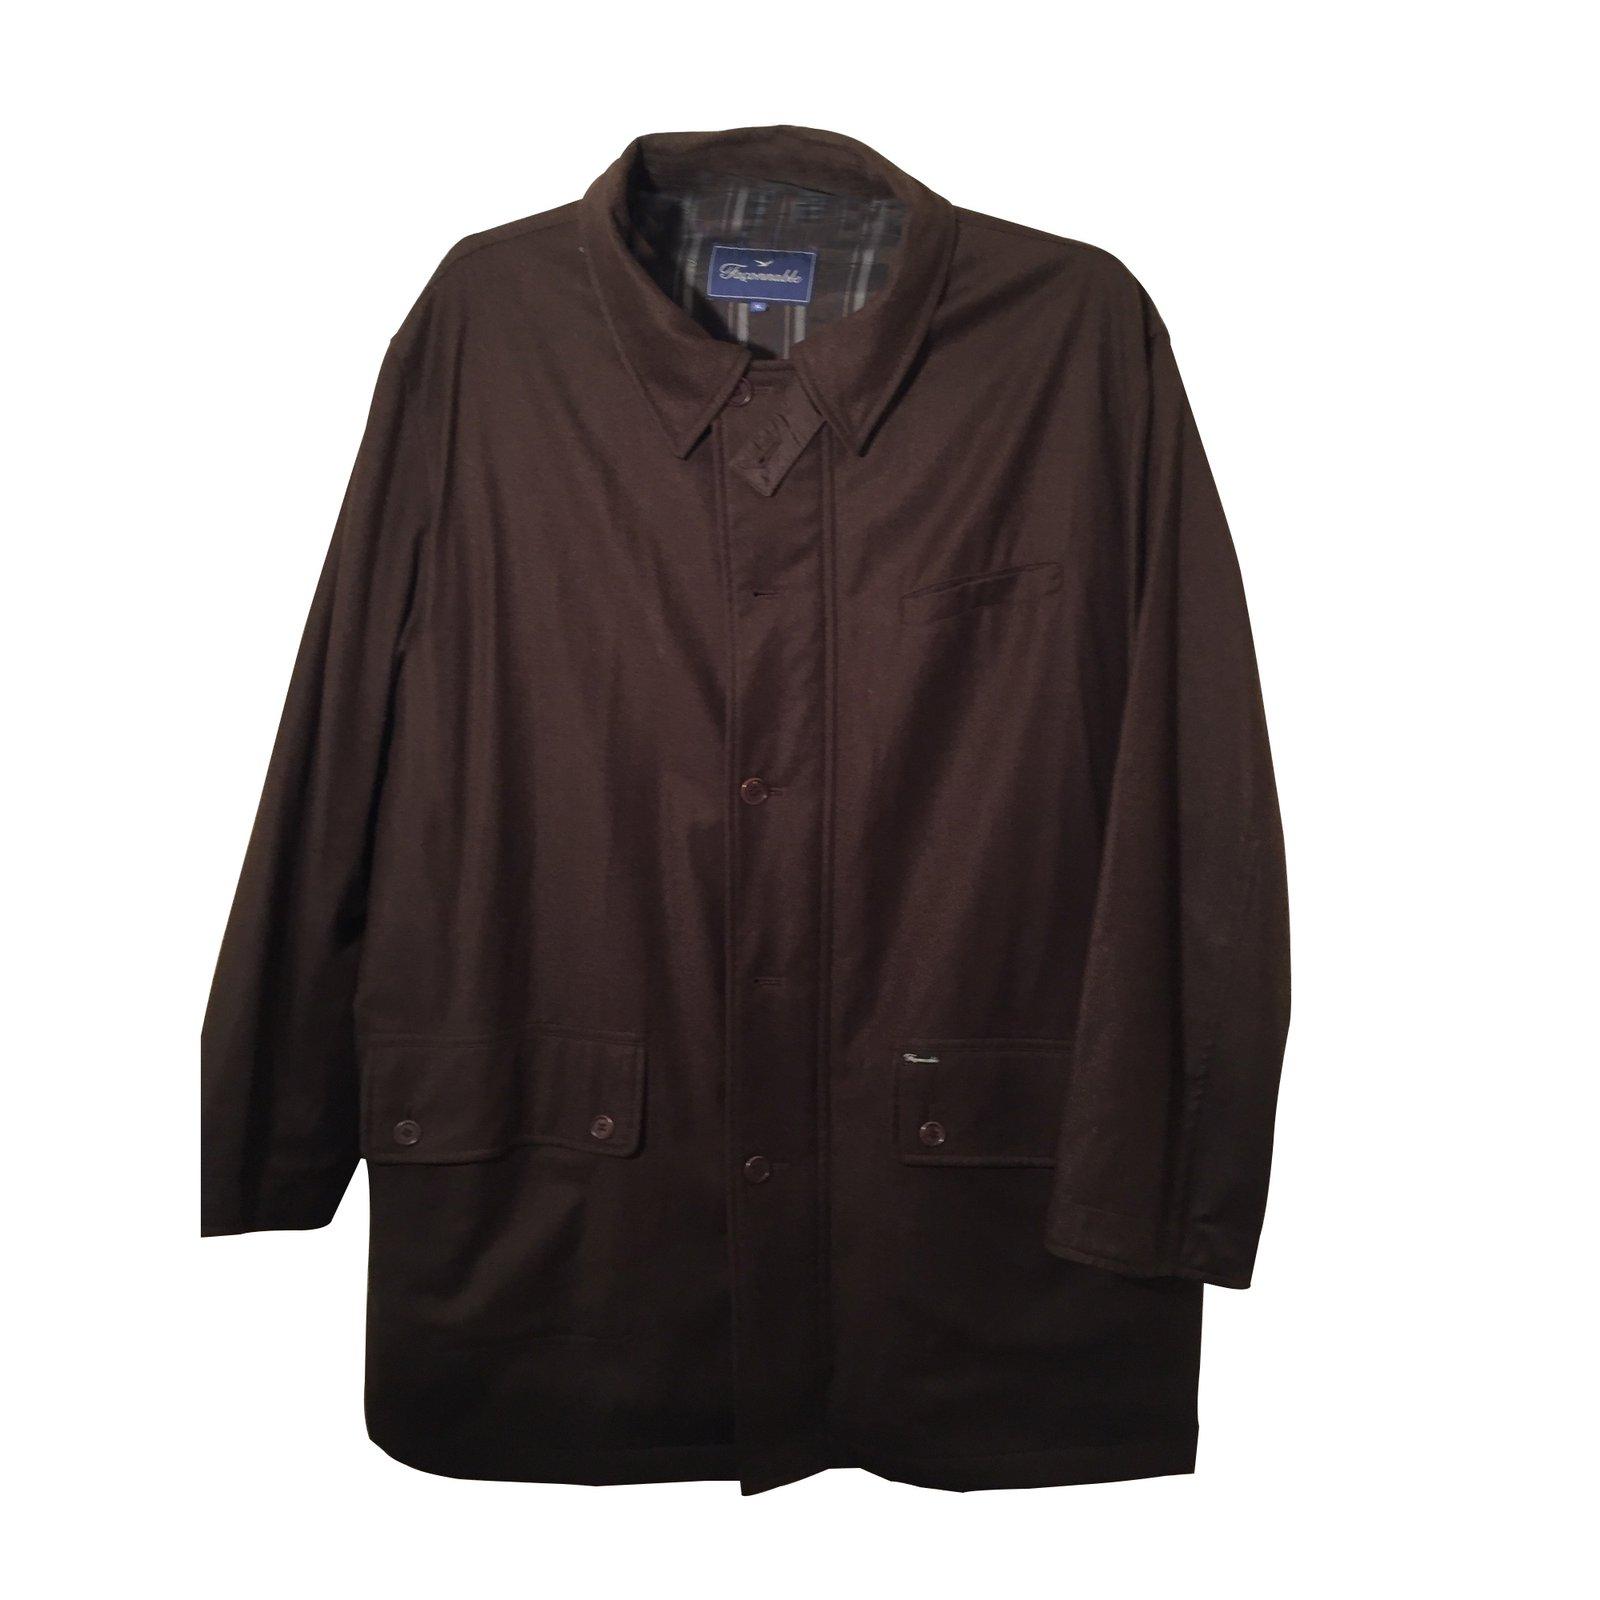 manteaux homme fa onnable parka polyester marron. Black Bedroom Furniture Sets. Home Design Ideas